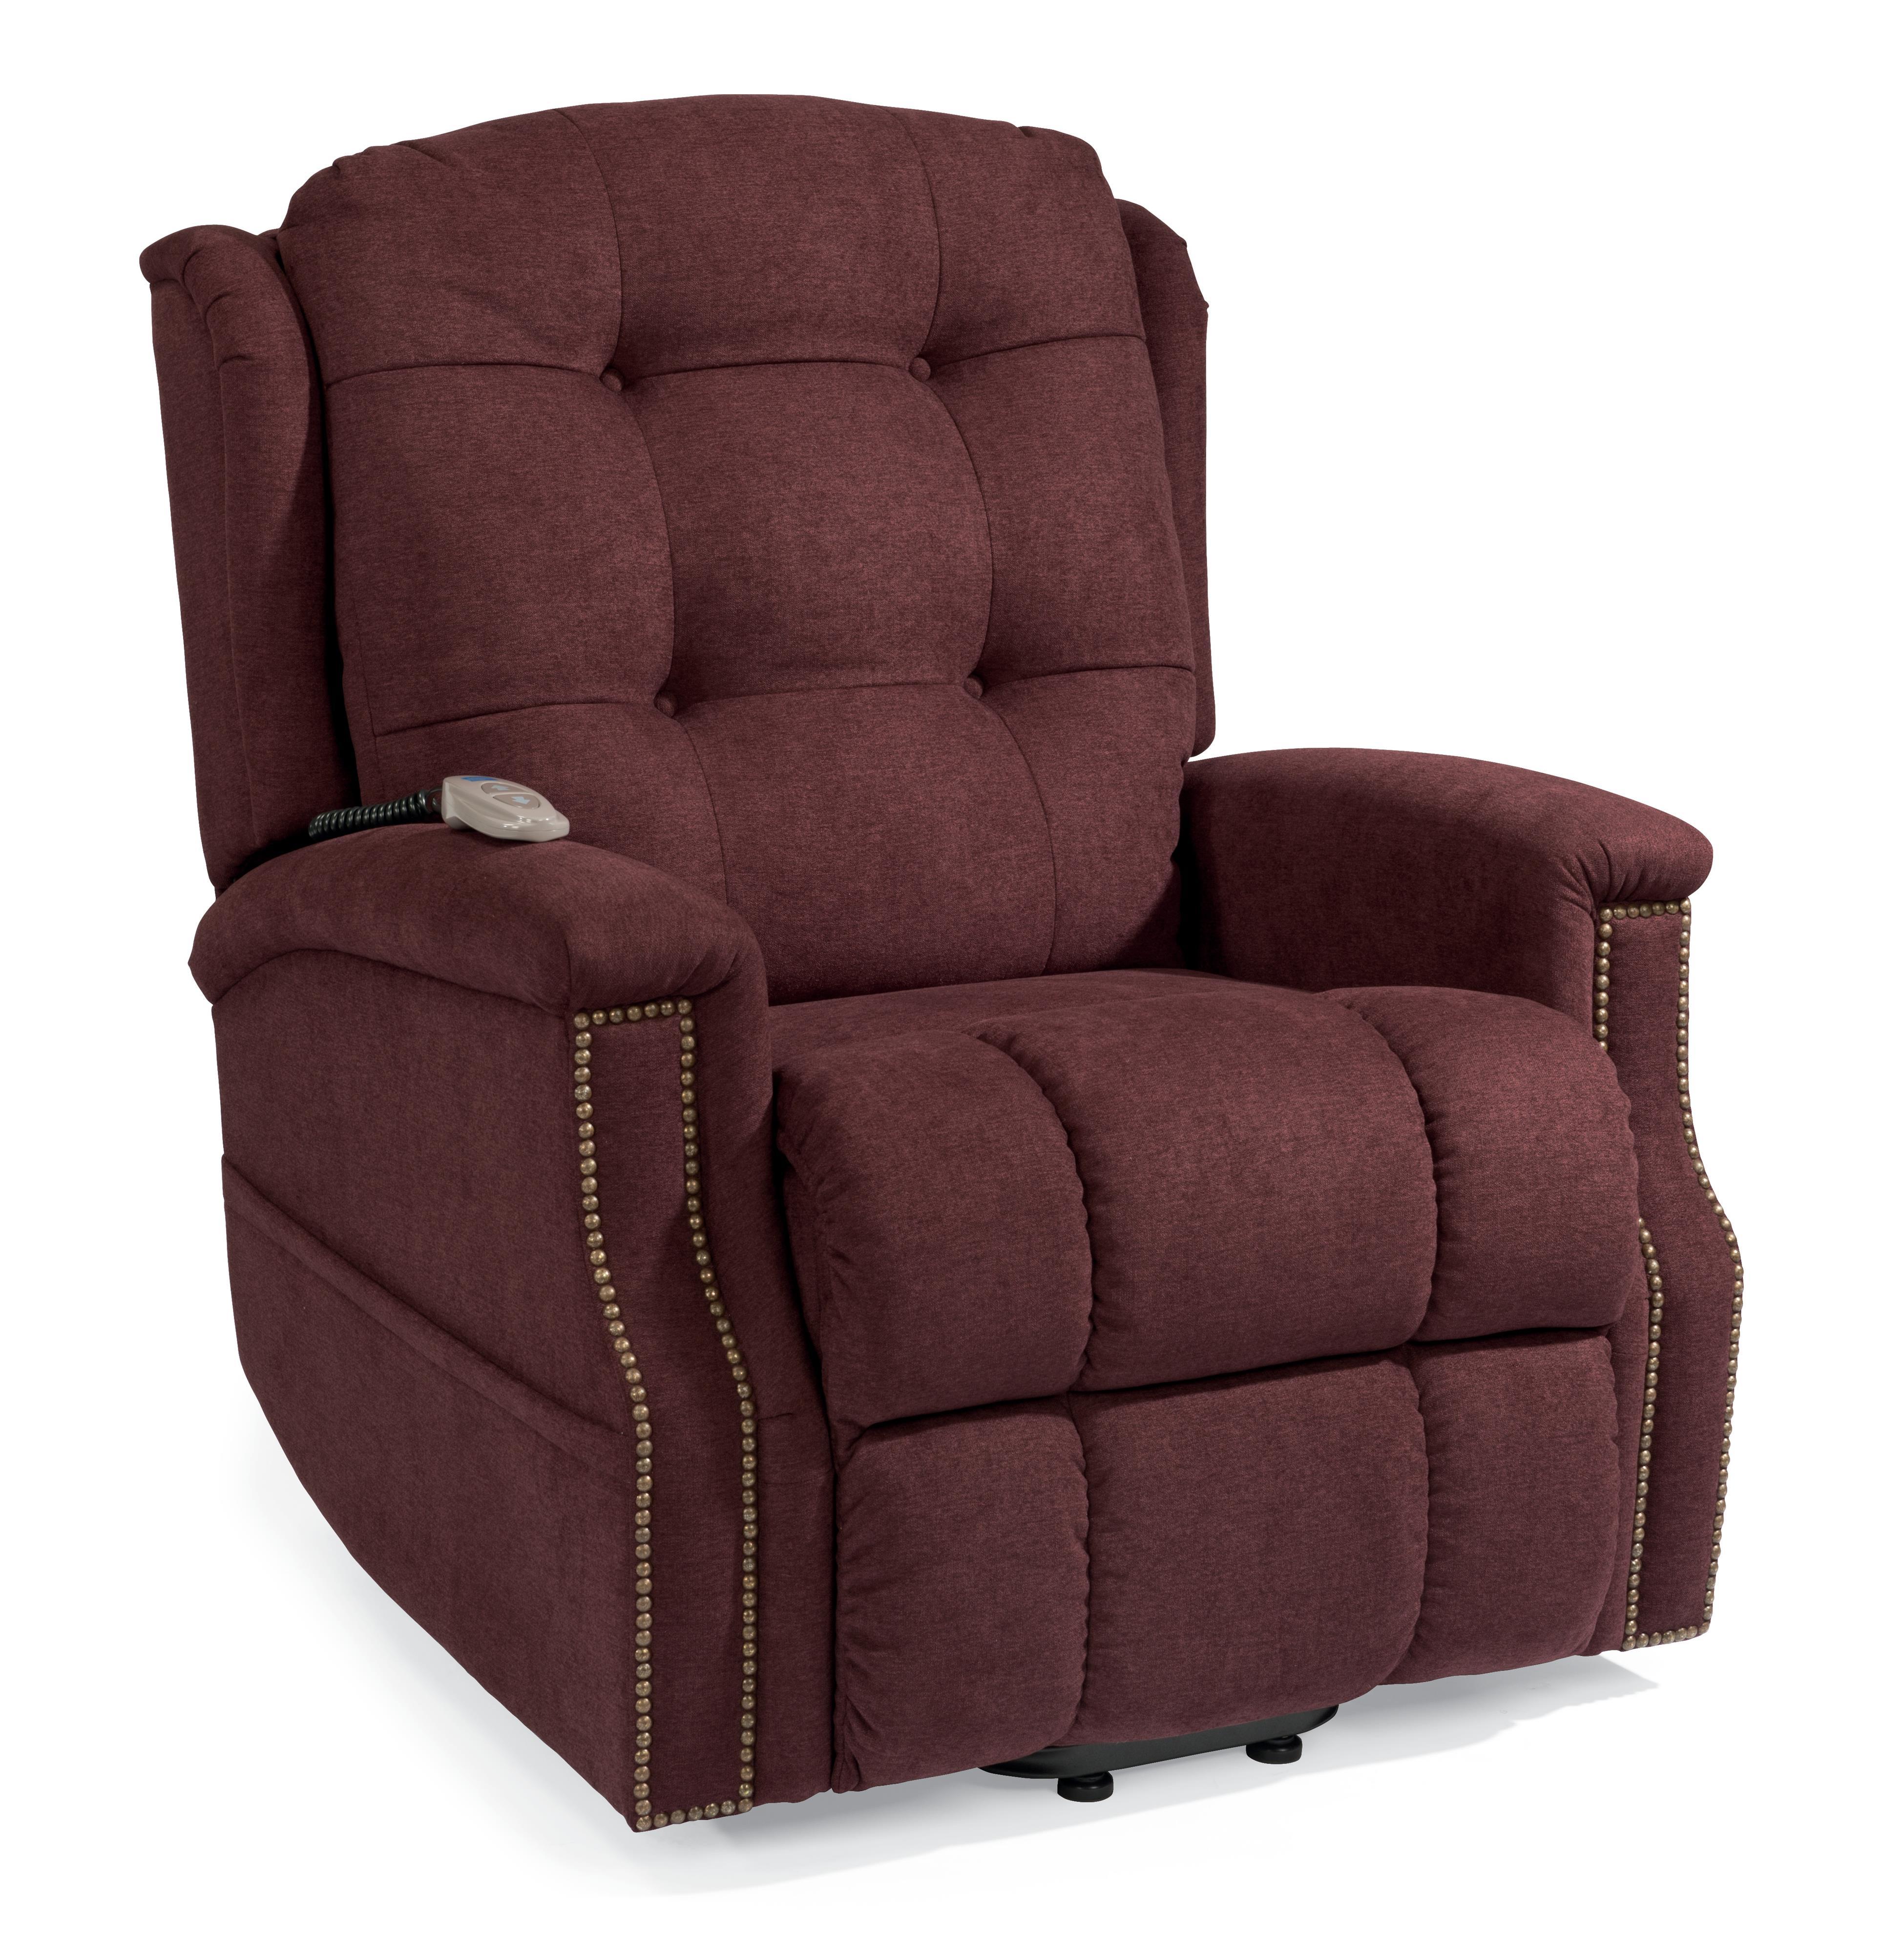 Flexsteel latitudes lift chairs alexander three way power for Wayside furniture